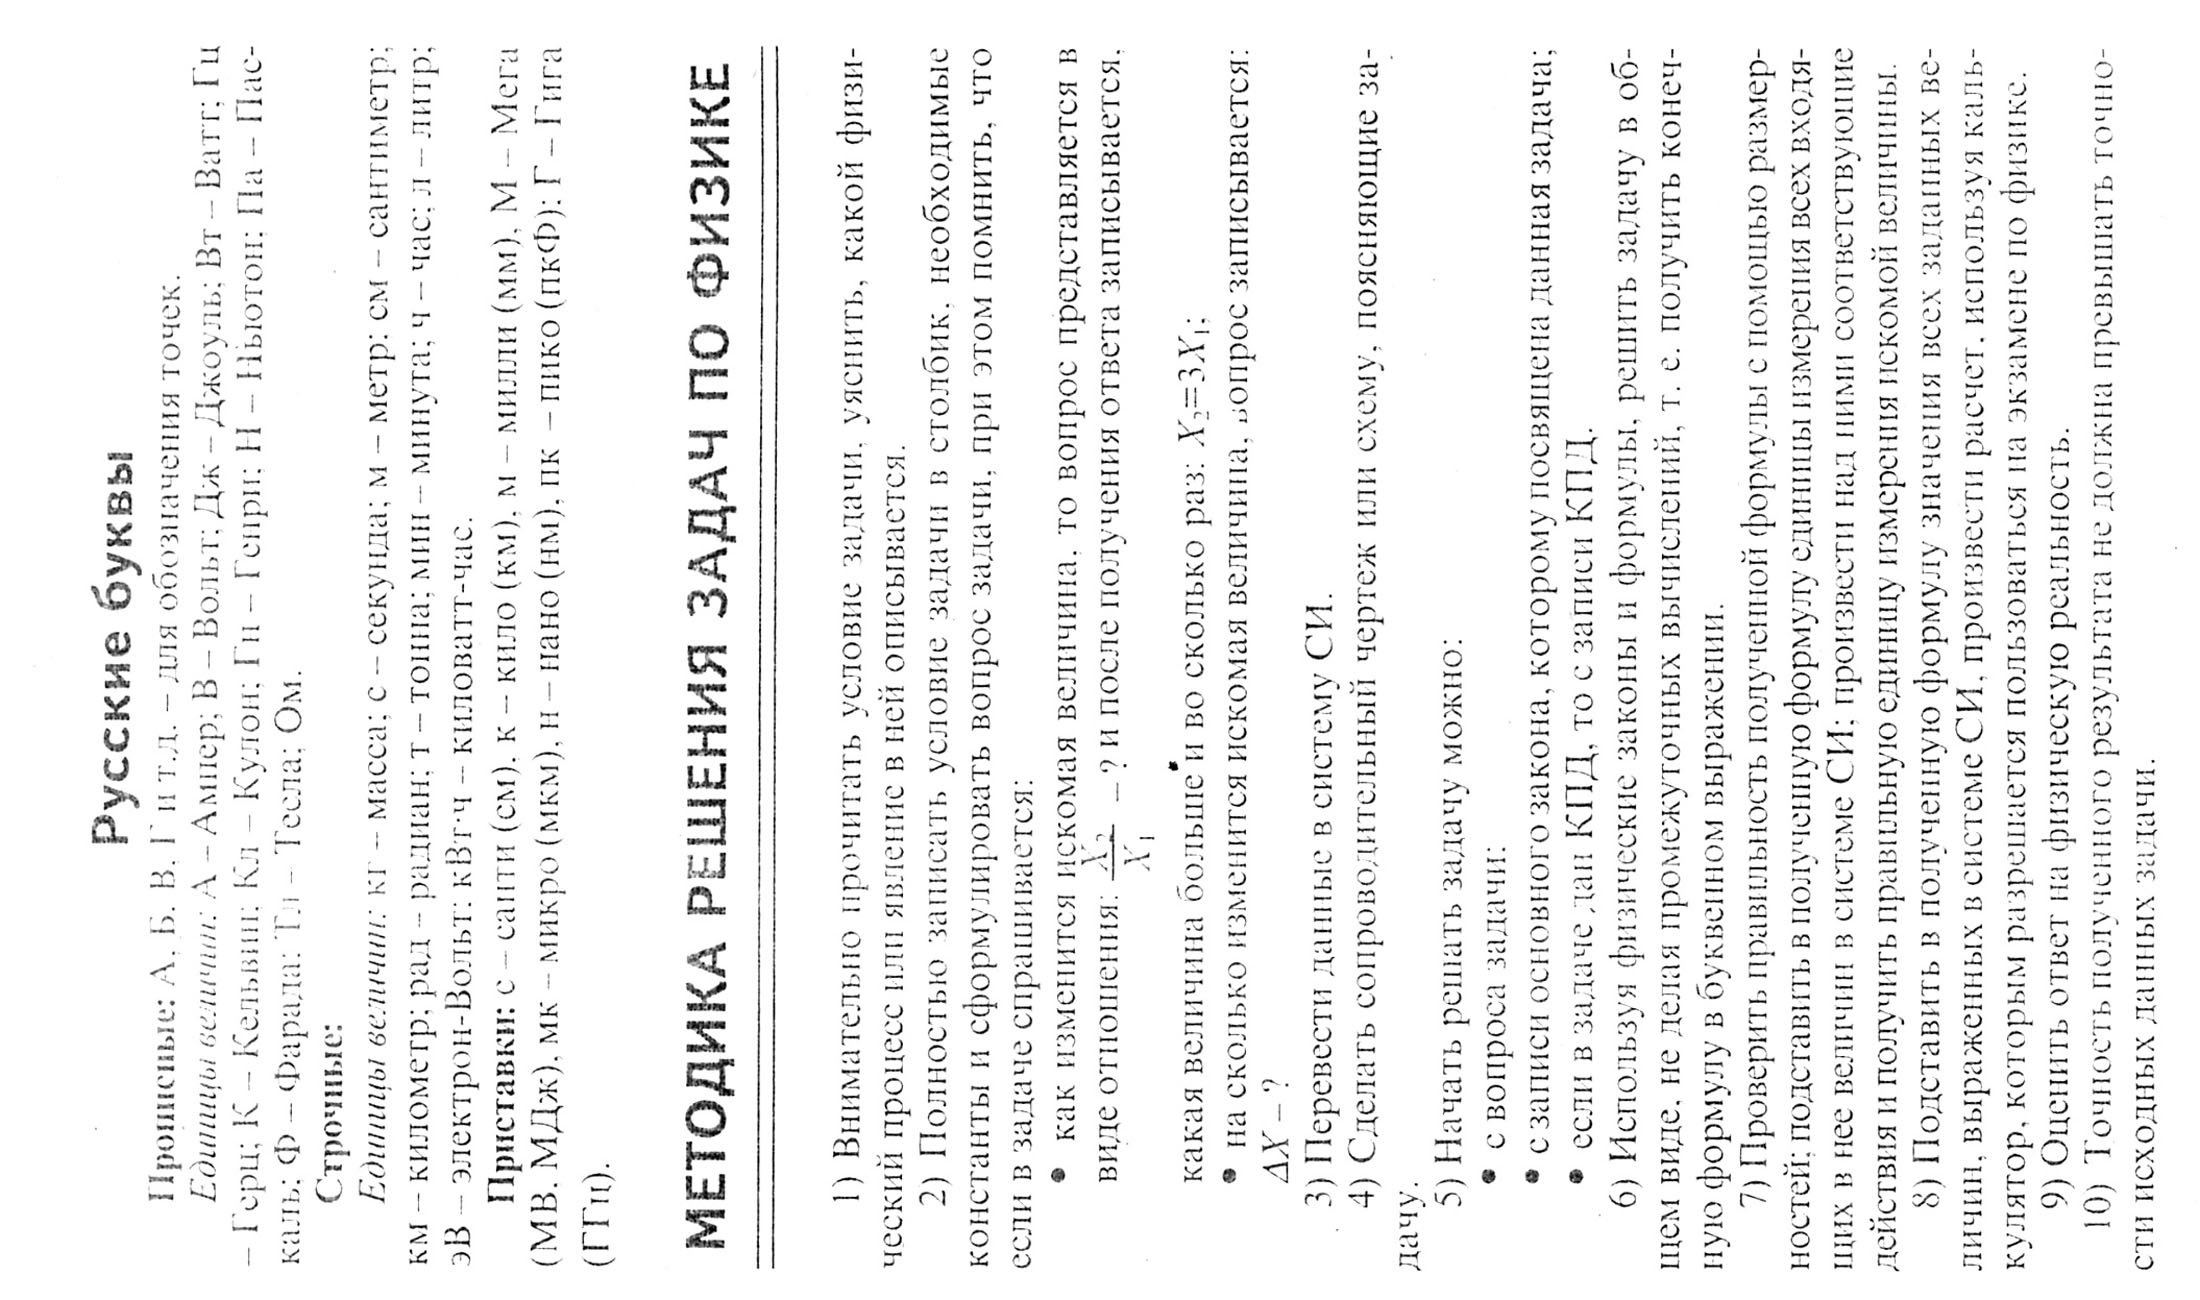 по олимпиады для шпаргалки формулы класс физике 9